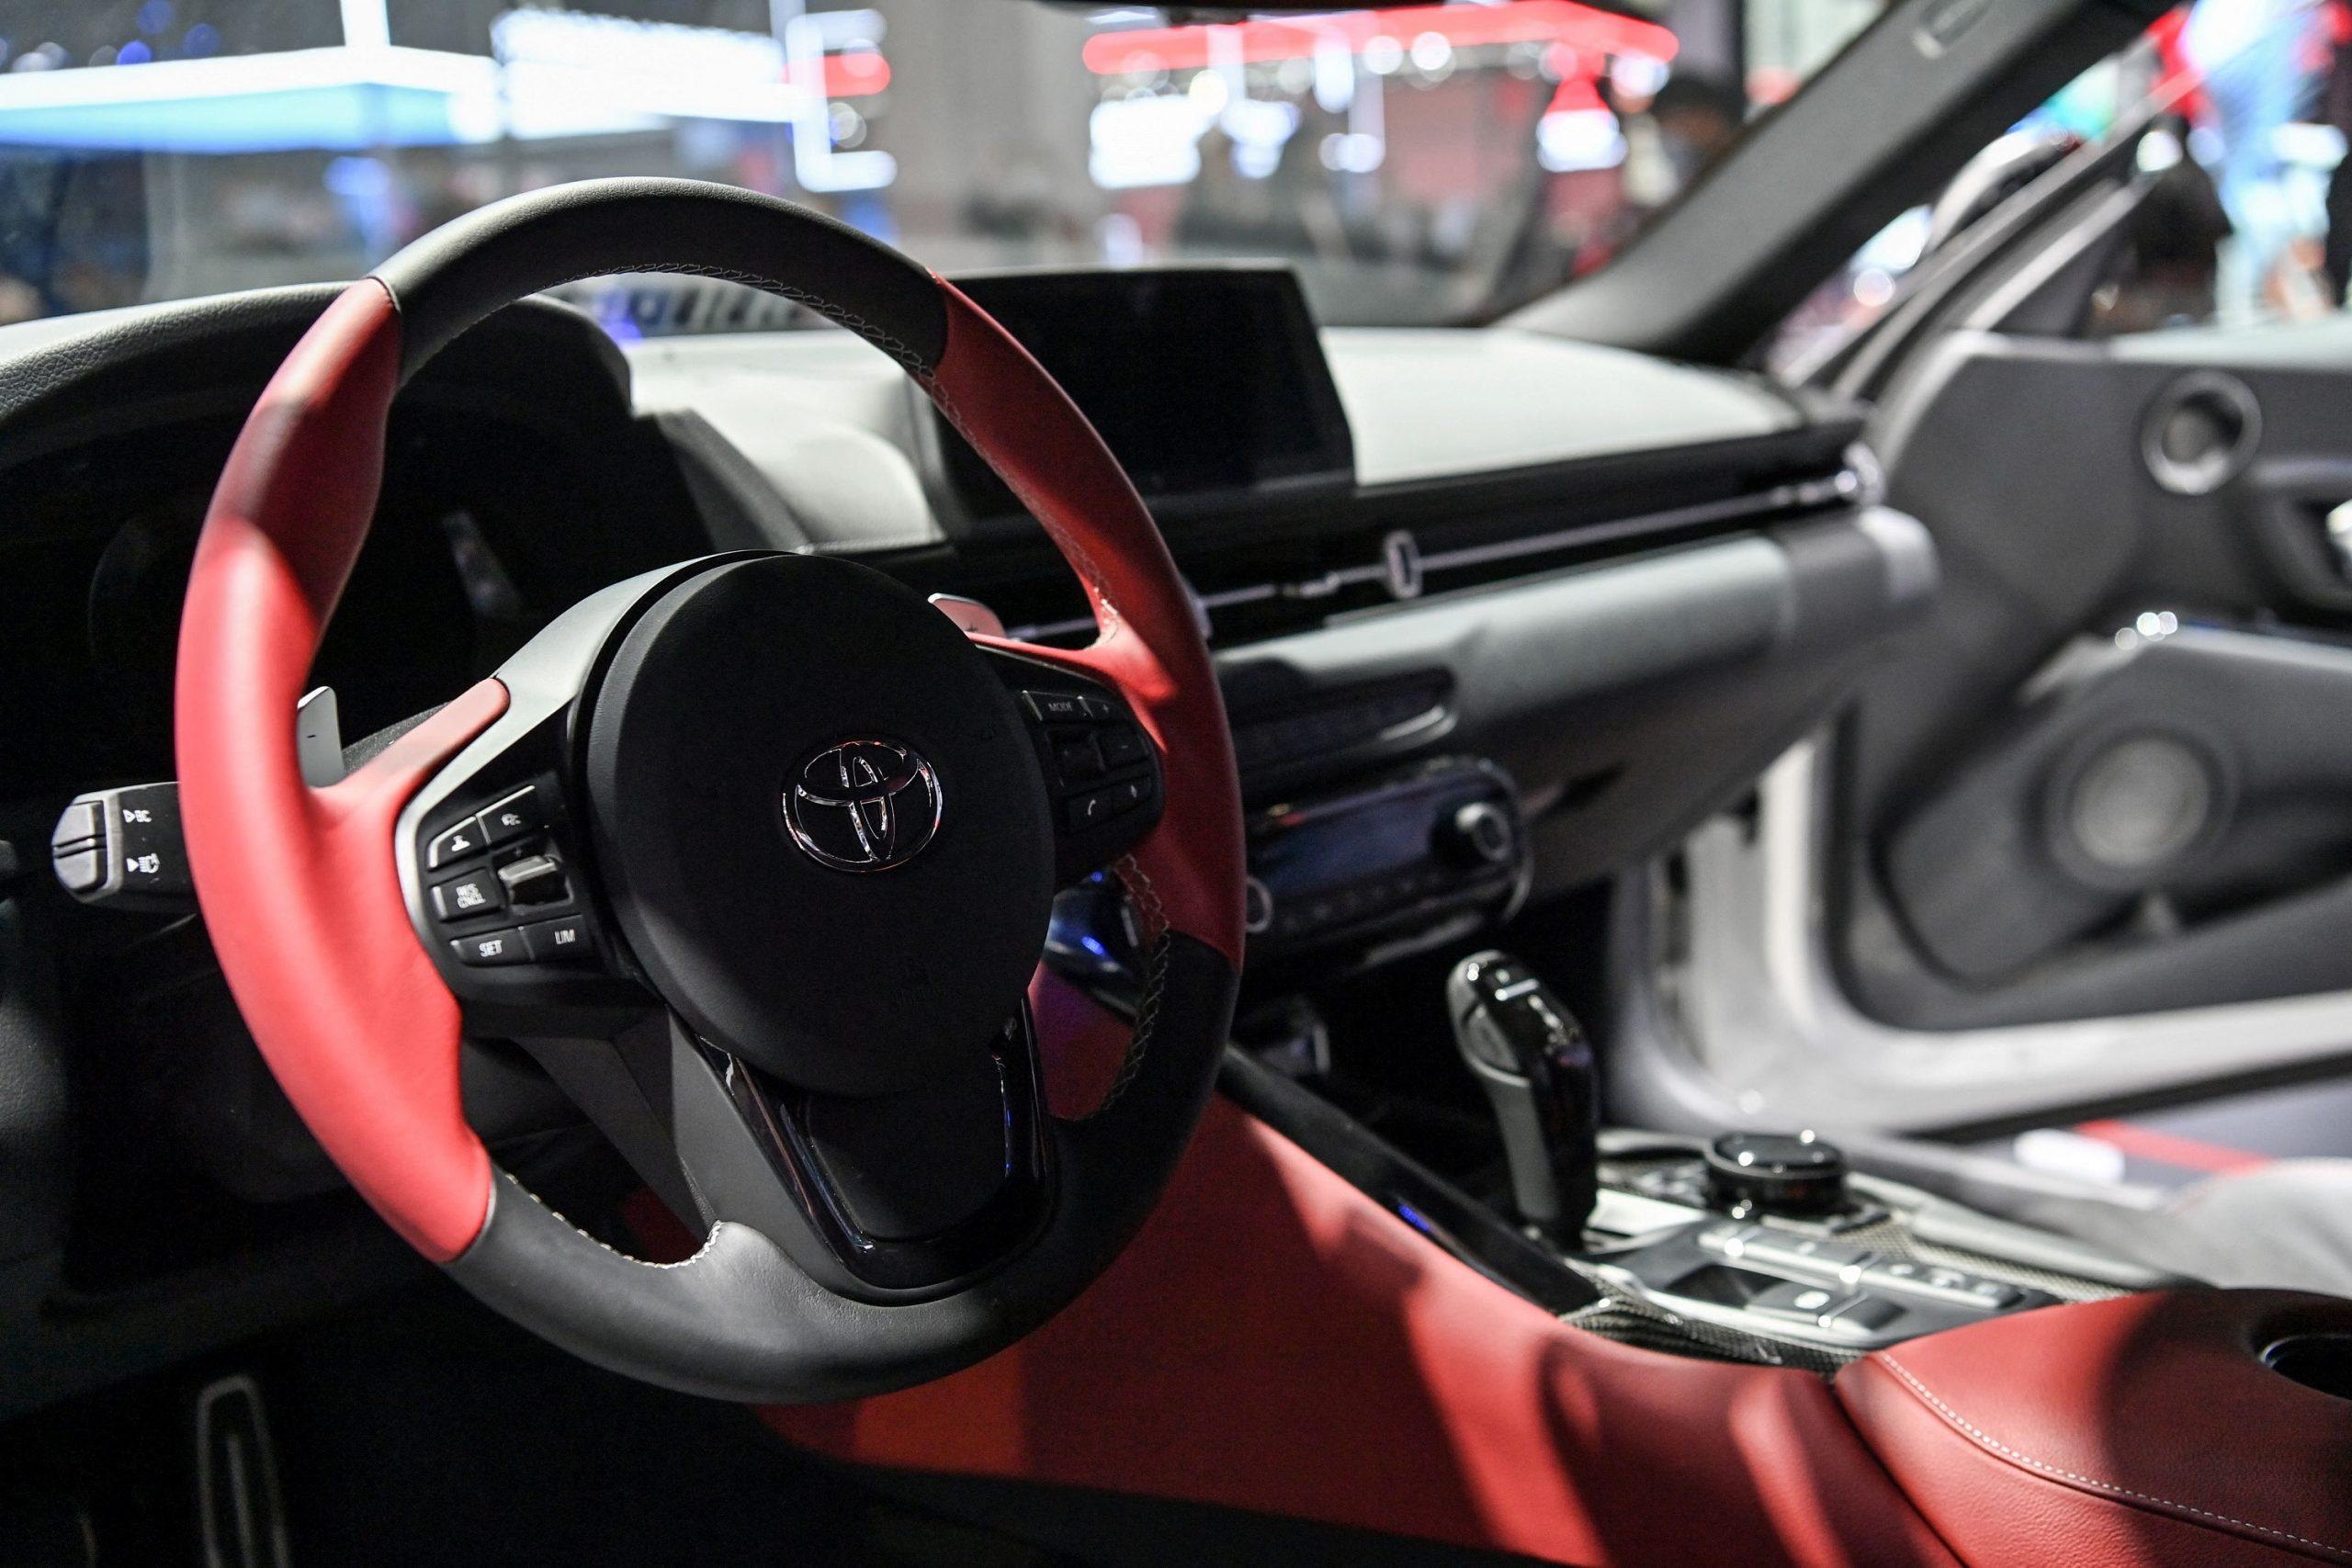 The interior of the new Toyota Supra